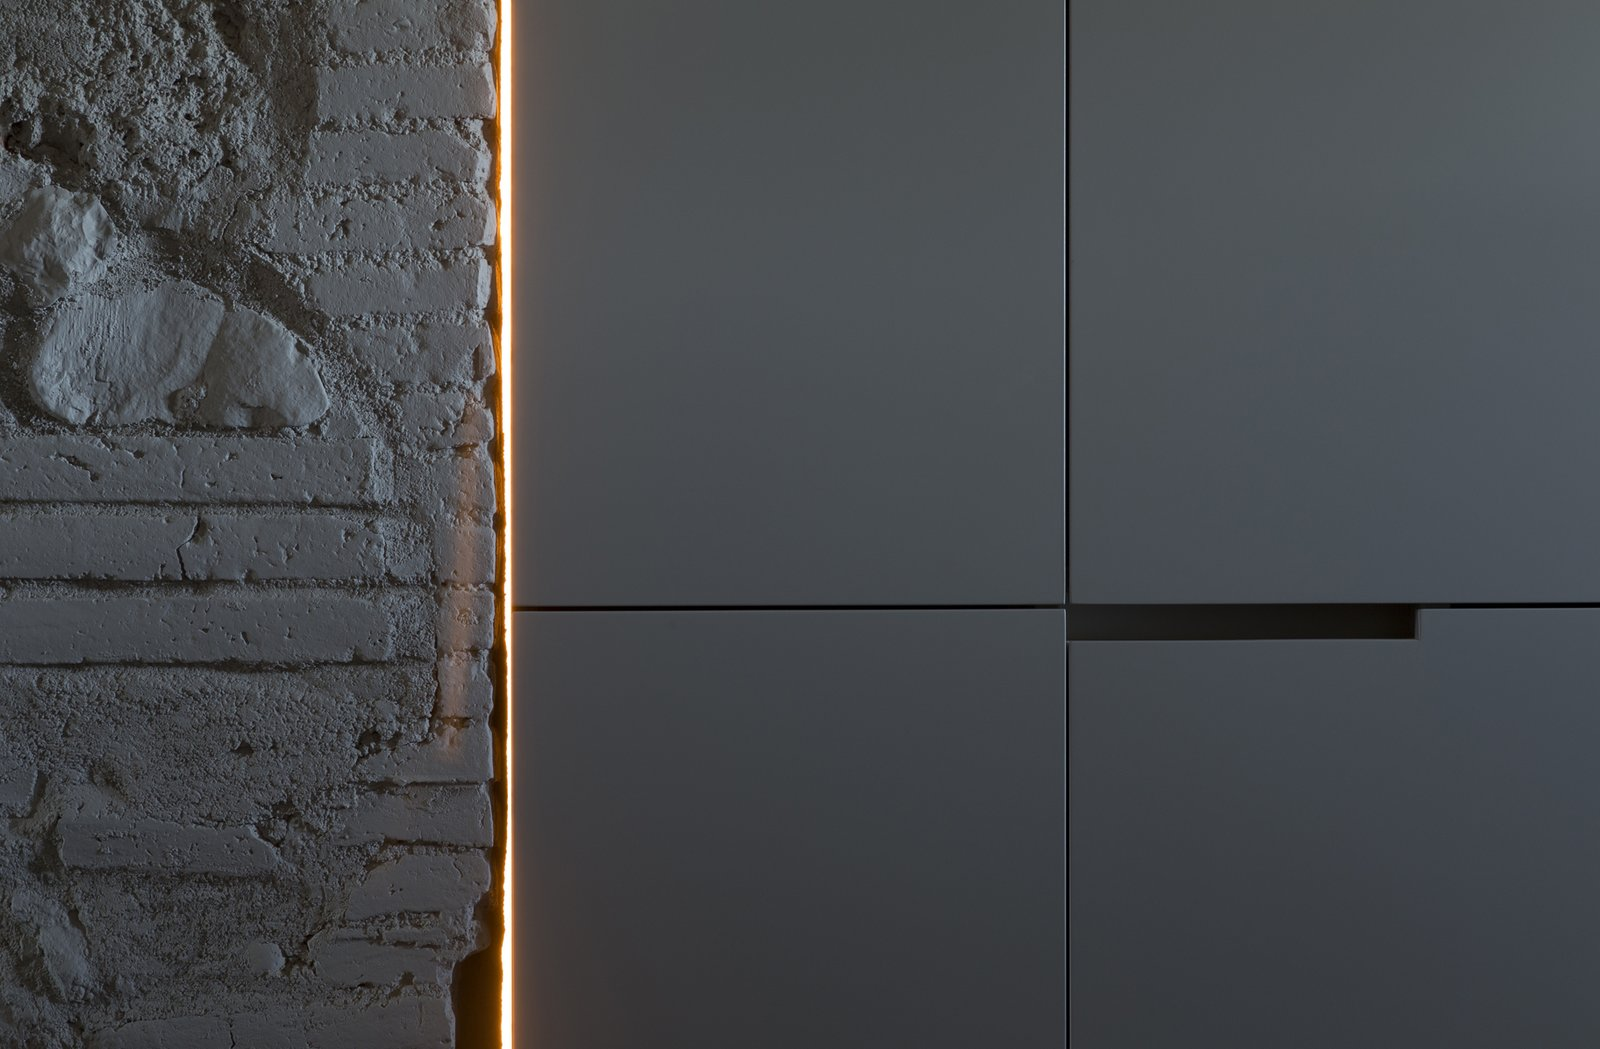 Doors, Swing Door Type, Wood, and Interior  Sant Martí House by Francesc Rifé Studio